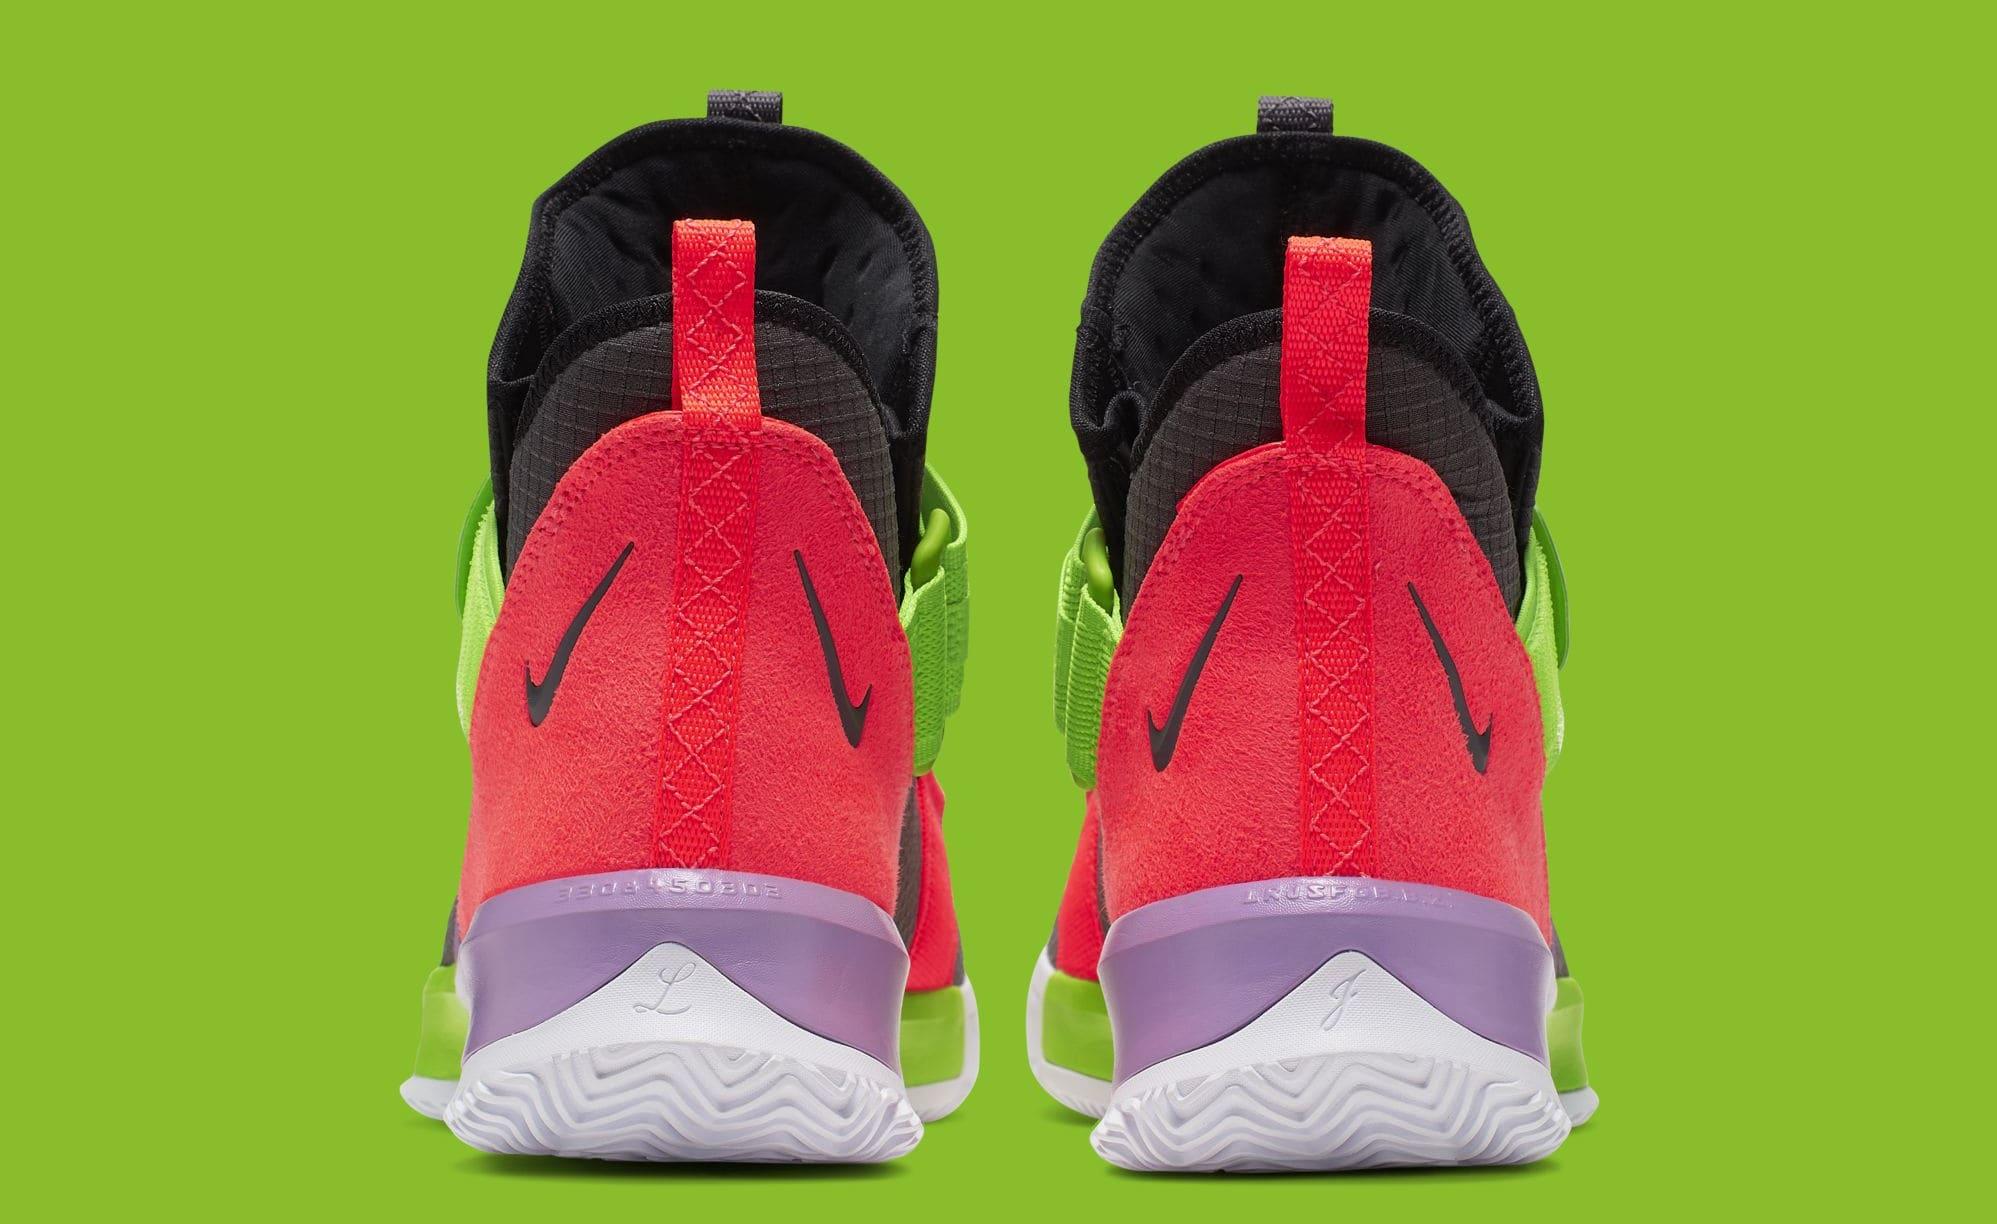 Nike LeBron Soldier 13 AR4228-002 (Heel)